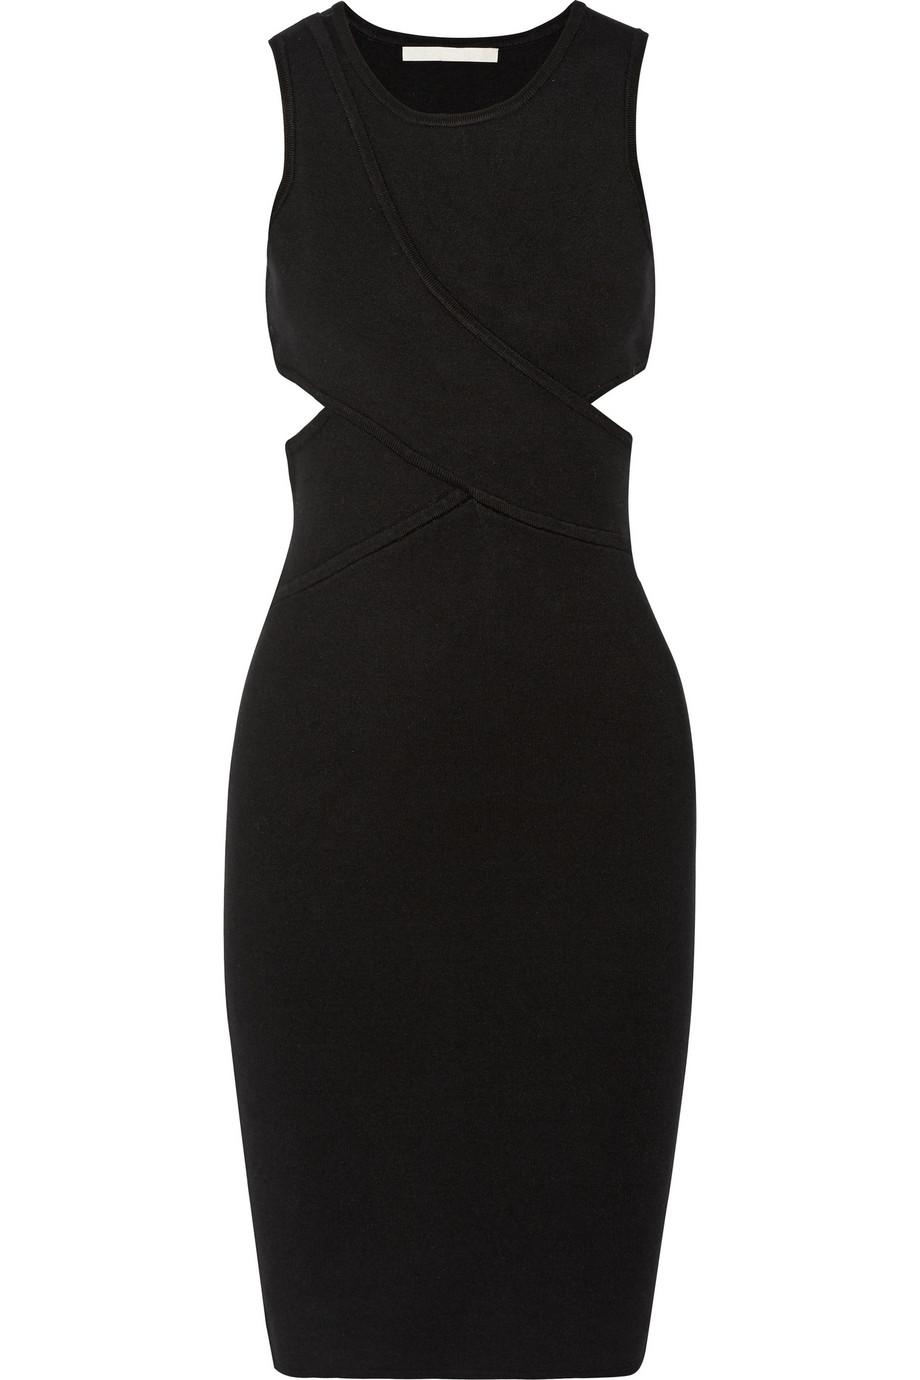 Jonathan Simkhai Harness cutout stretch-knit dress – 50% at THE OUTNET.COM